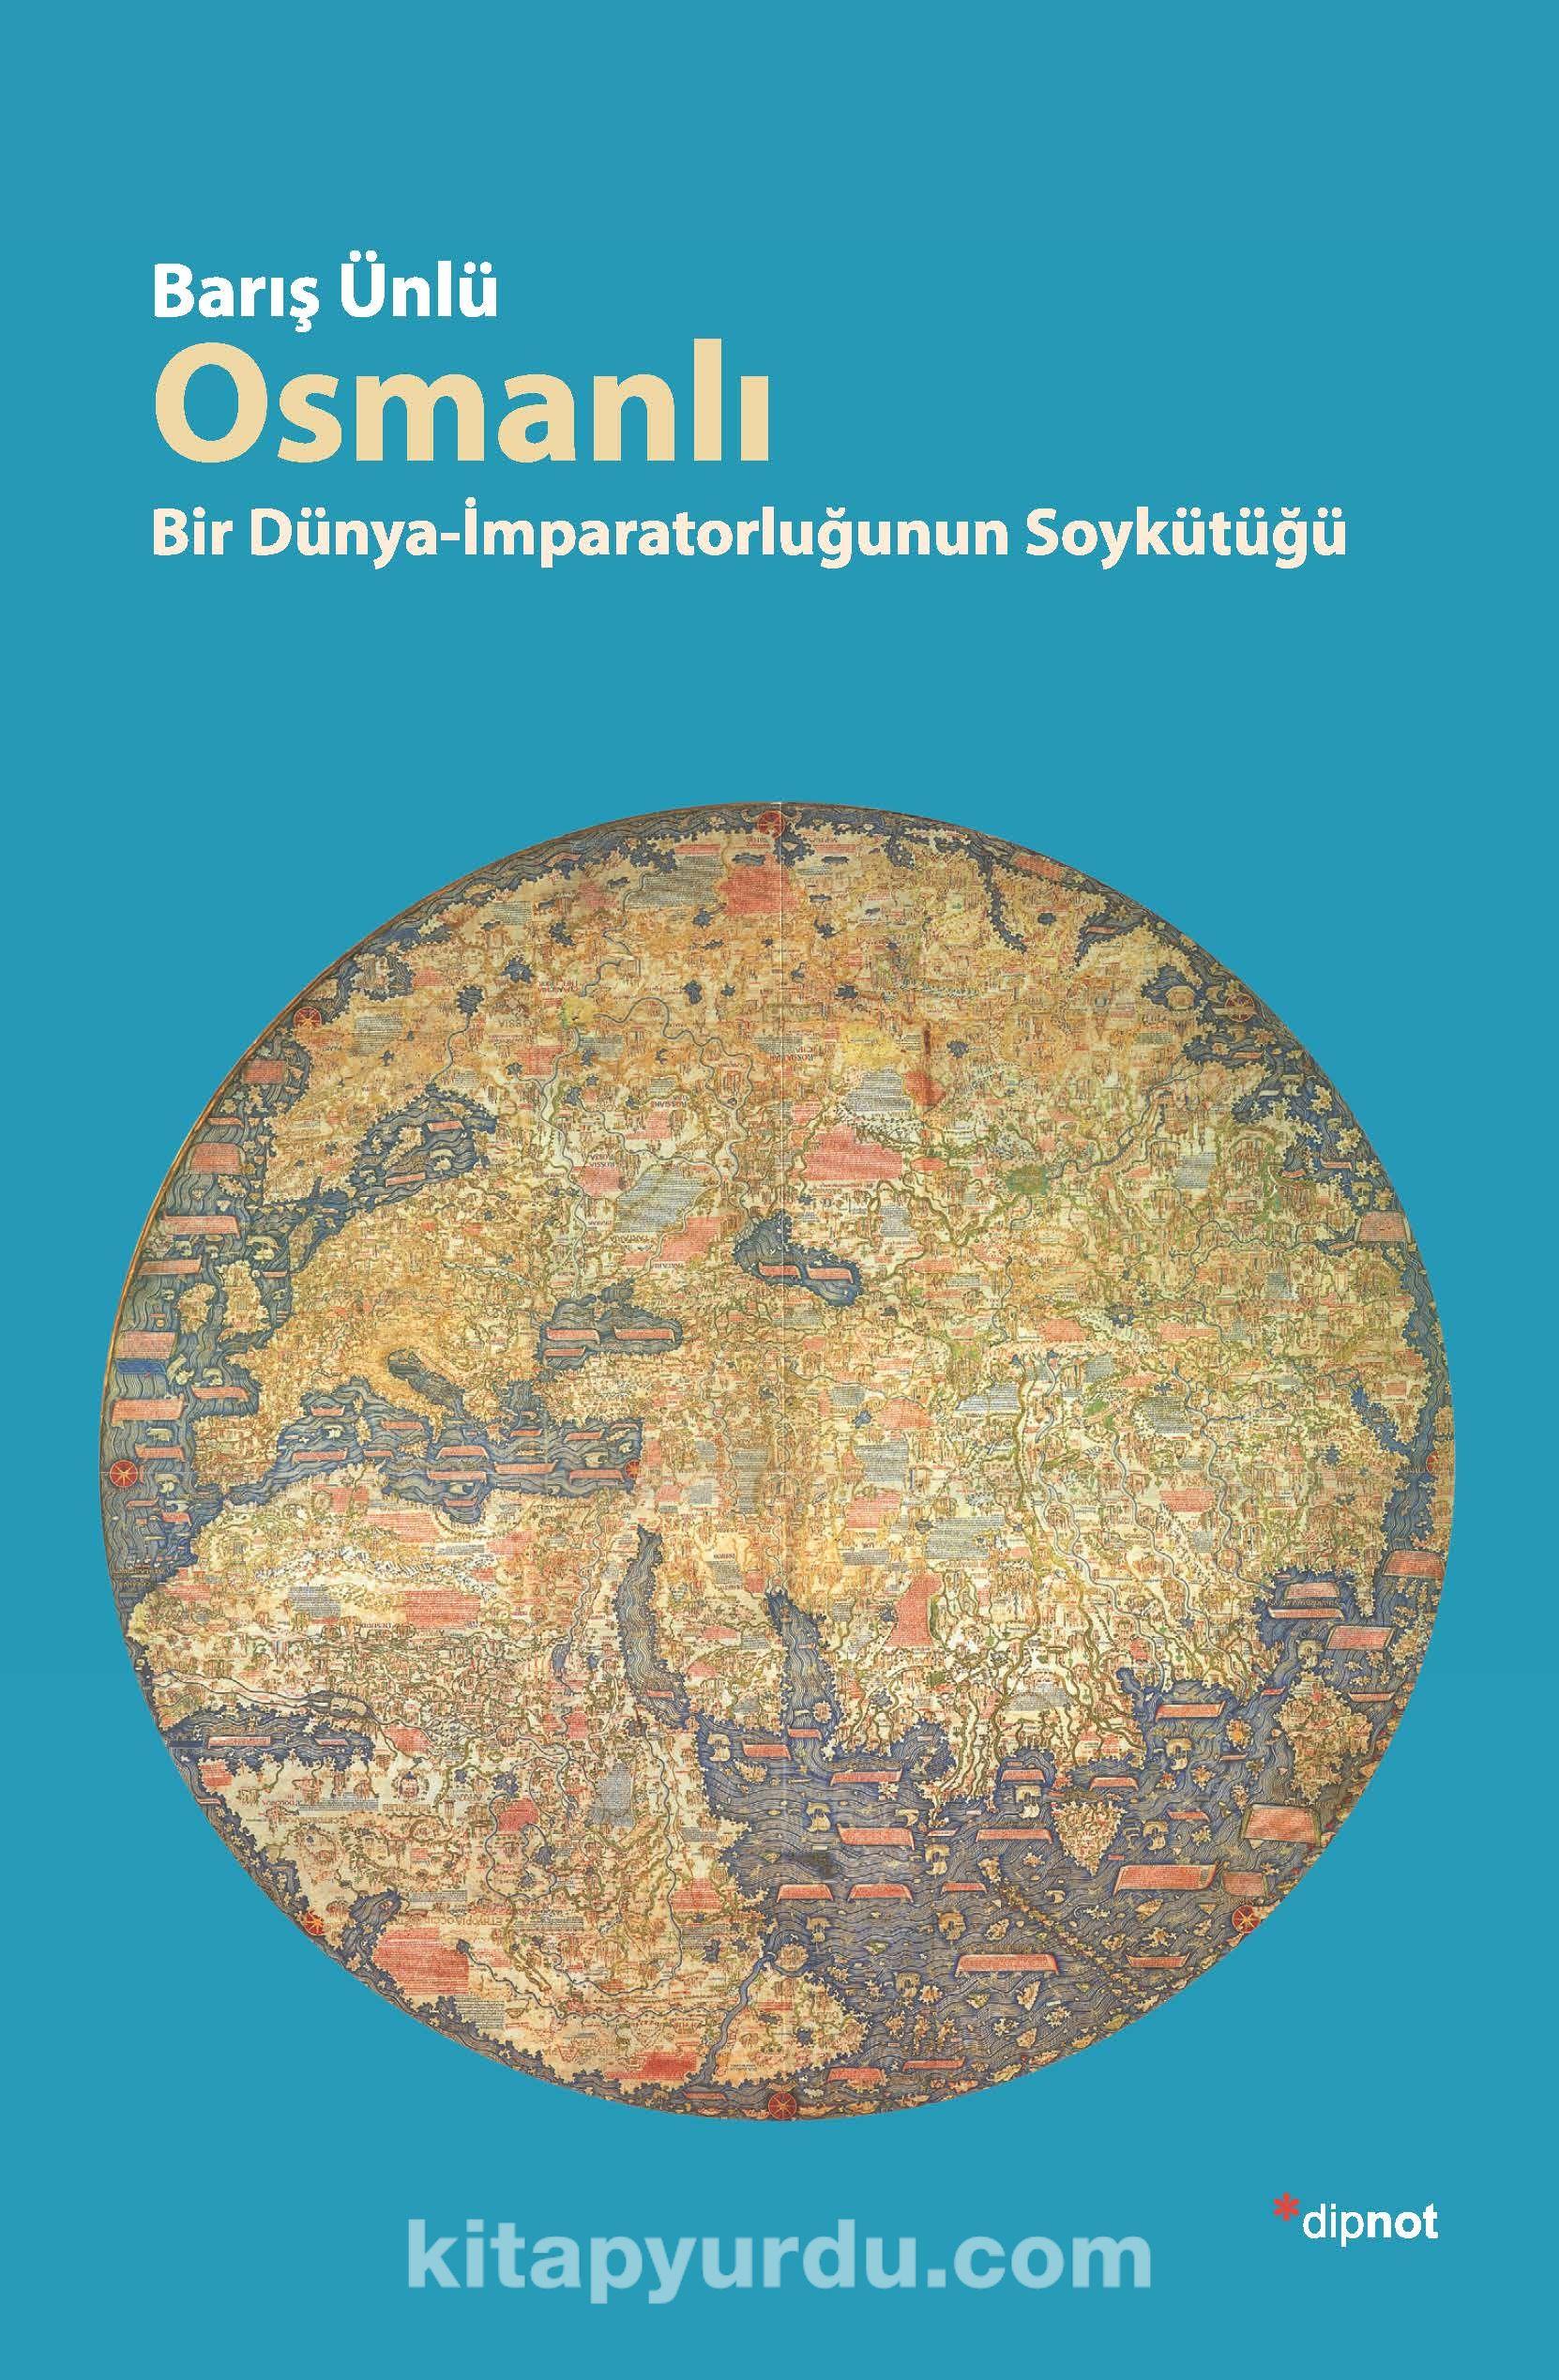 OsmanlıBir Dünya İmparatorluğunun Soykütüğü - Barış Ünlü pdf epub